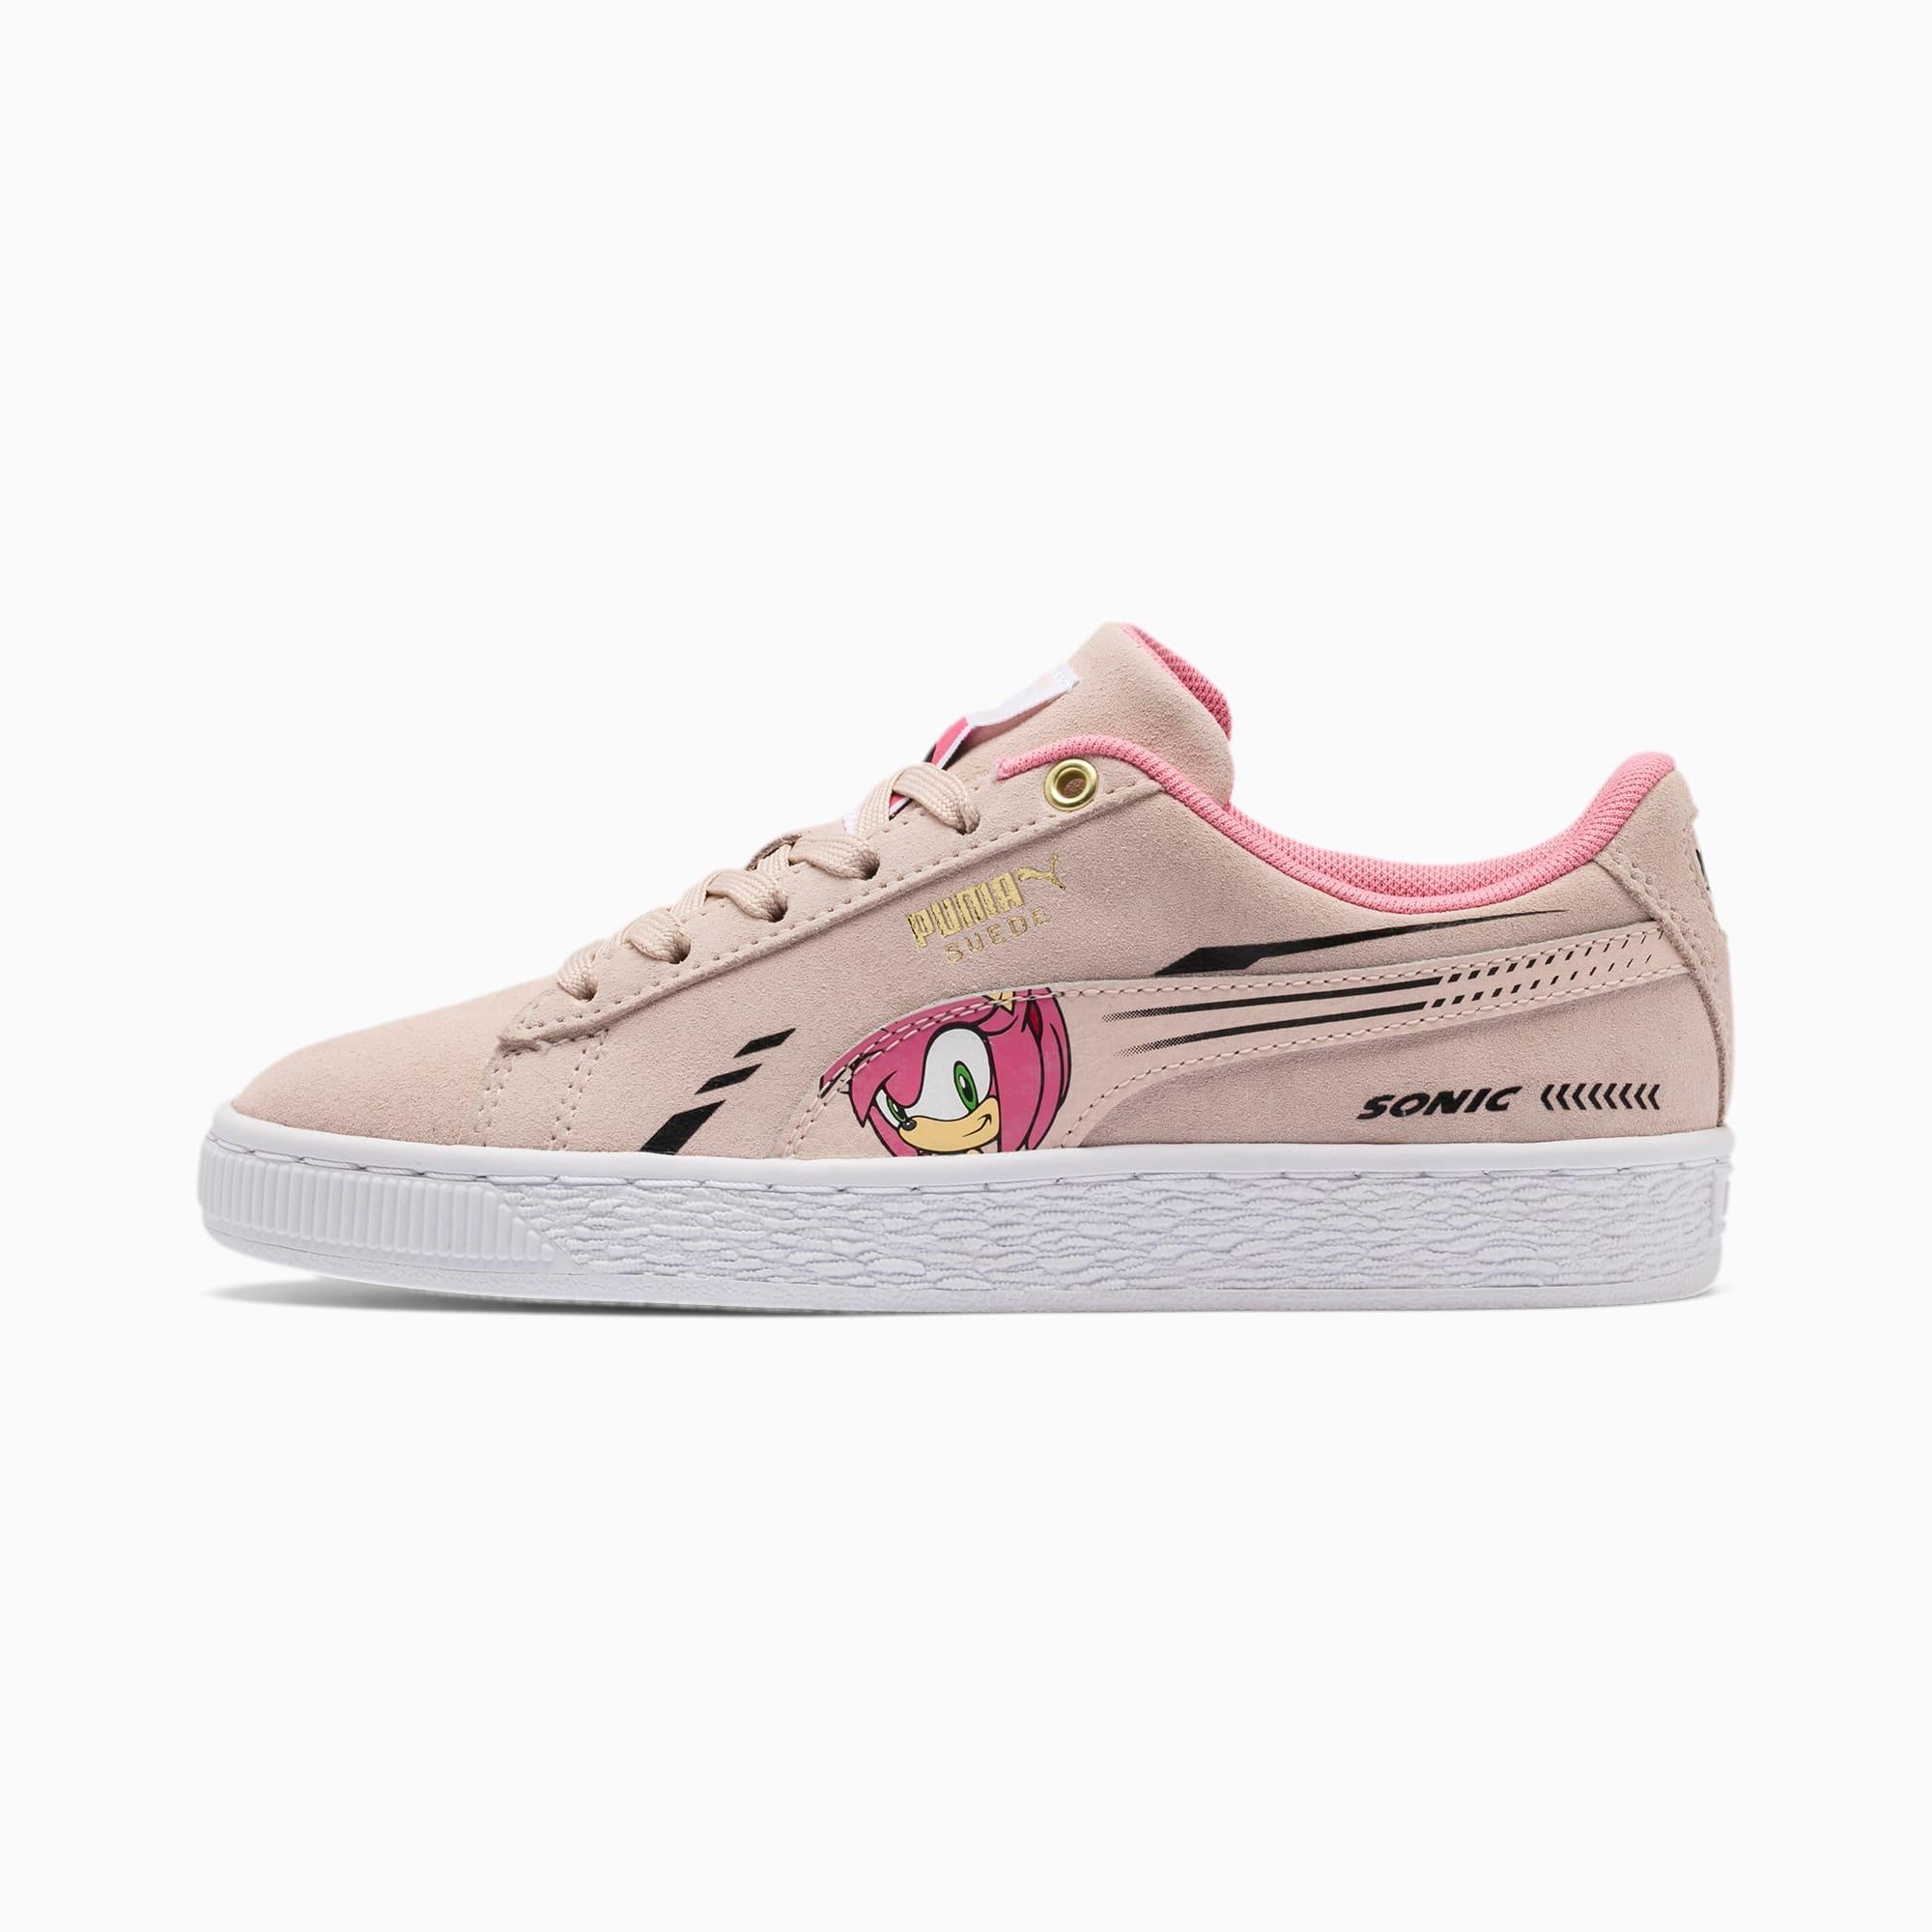 puma sonic chaussures